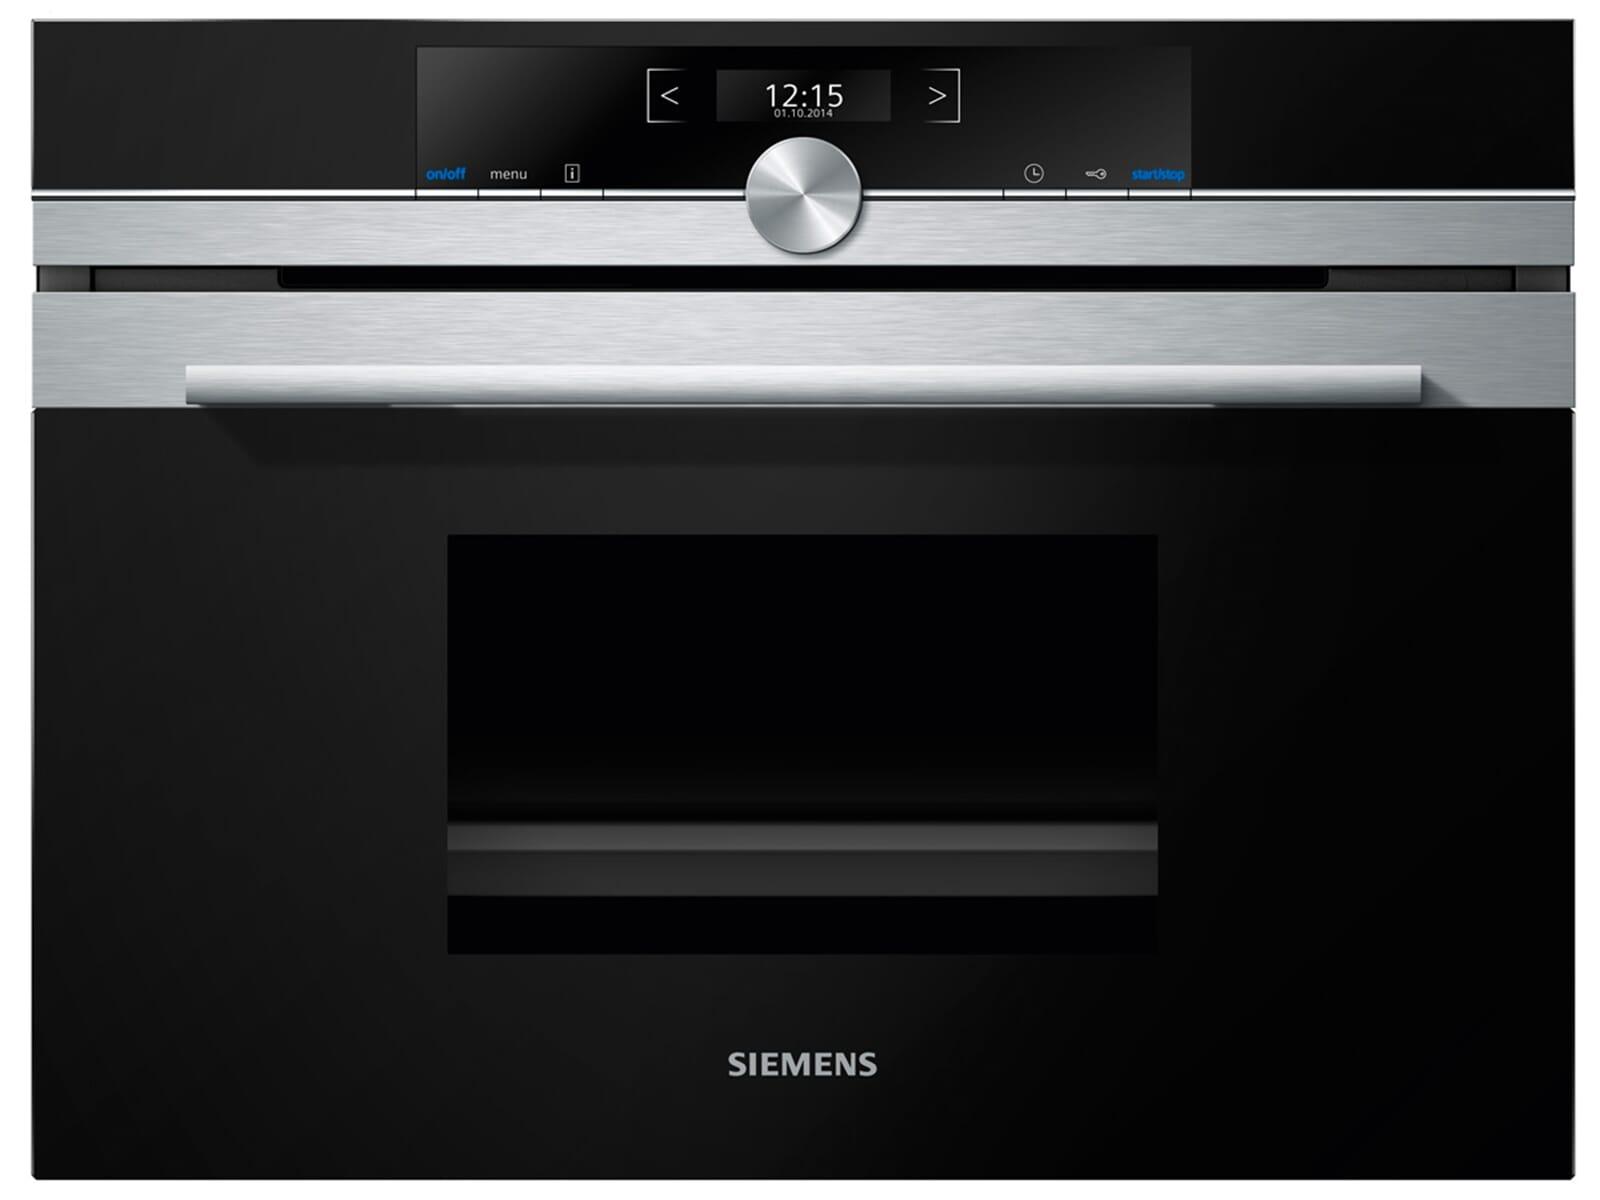 Siemens Cd634gbs1 Kompakt Dampfgarer Edelstahl